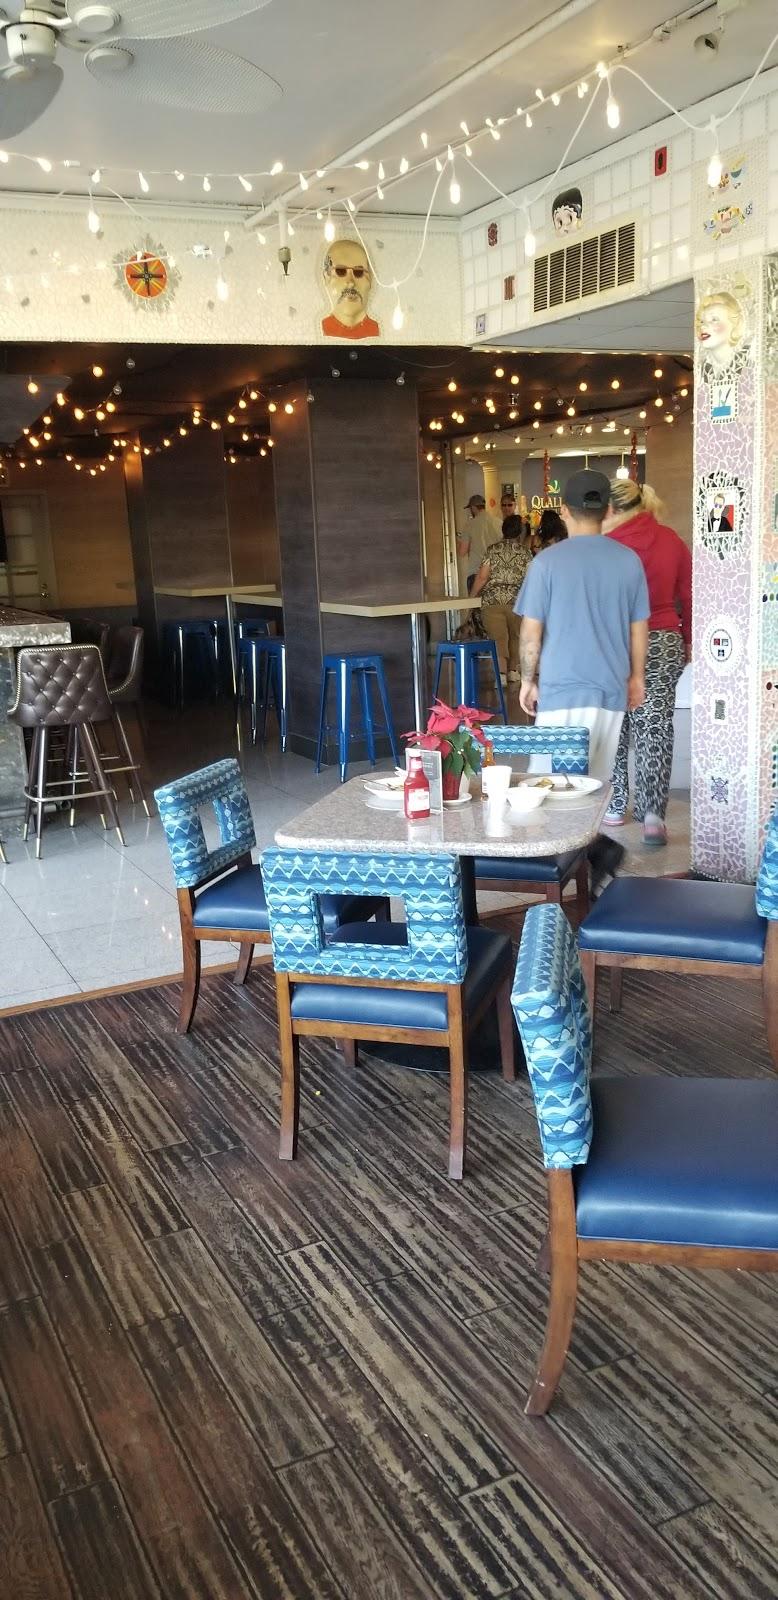 Oasis Restaurant & Bar - restaurant    Photo 6 of 9   Address: 7709 Telegraph Rd, Montebello, CA 90640, USA   Phone: (323) 724-1400